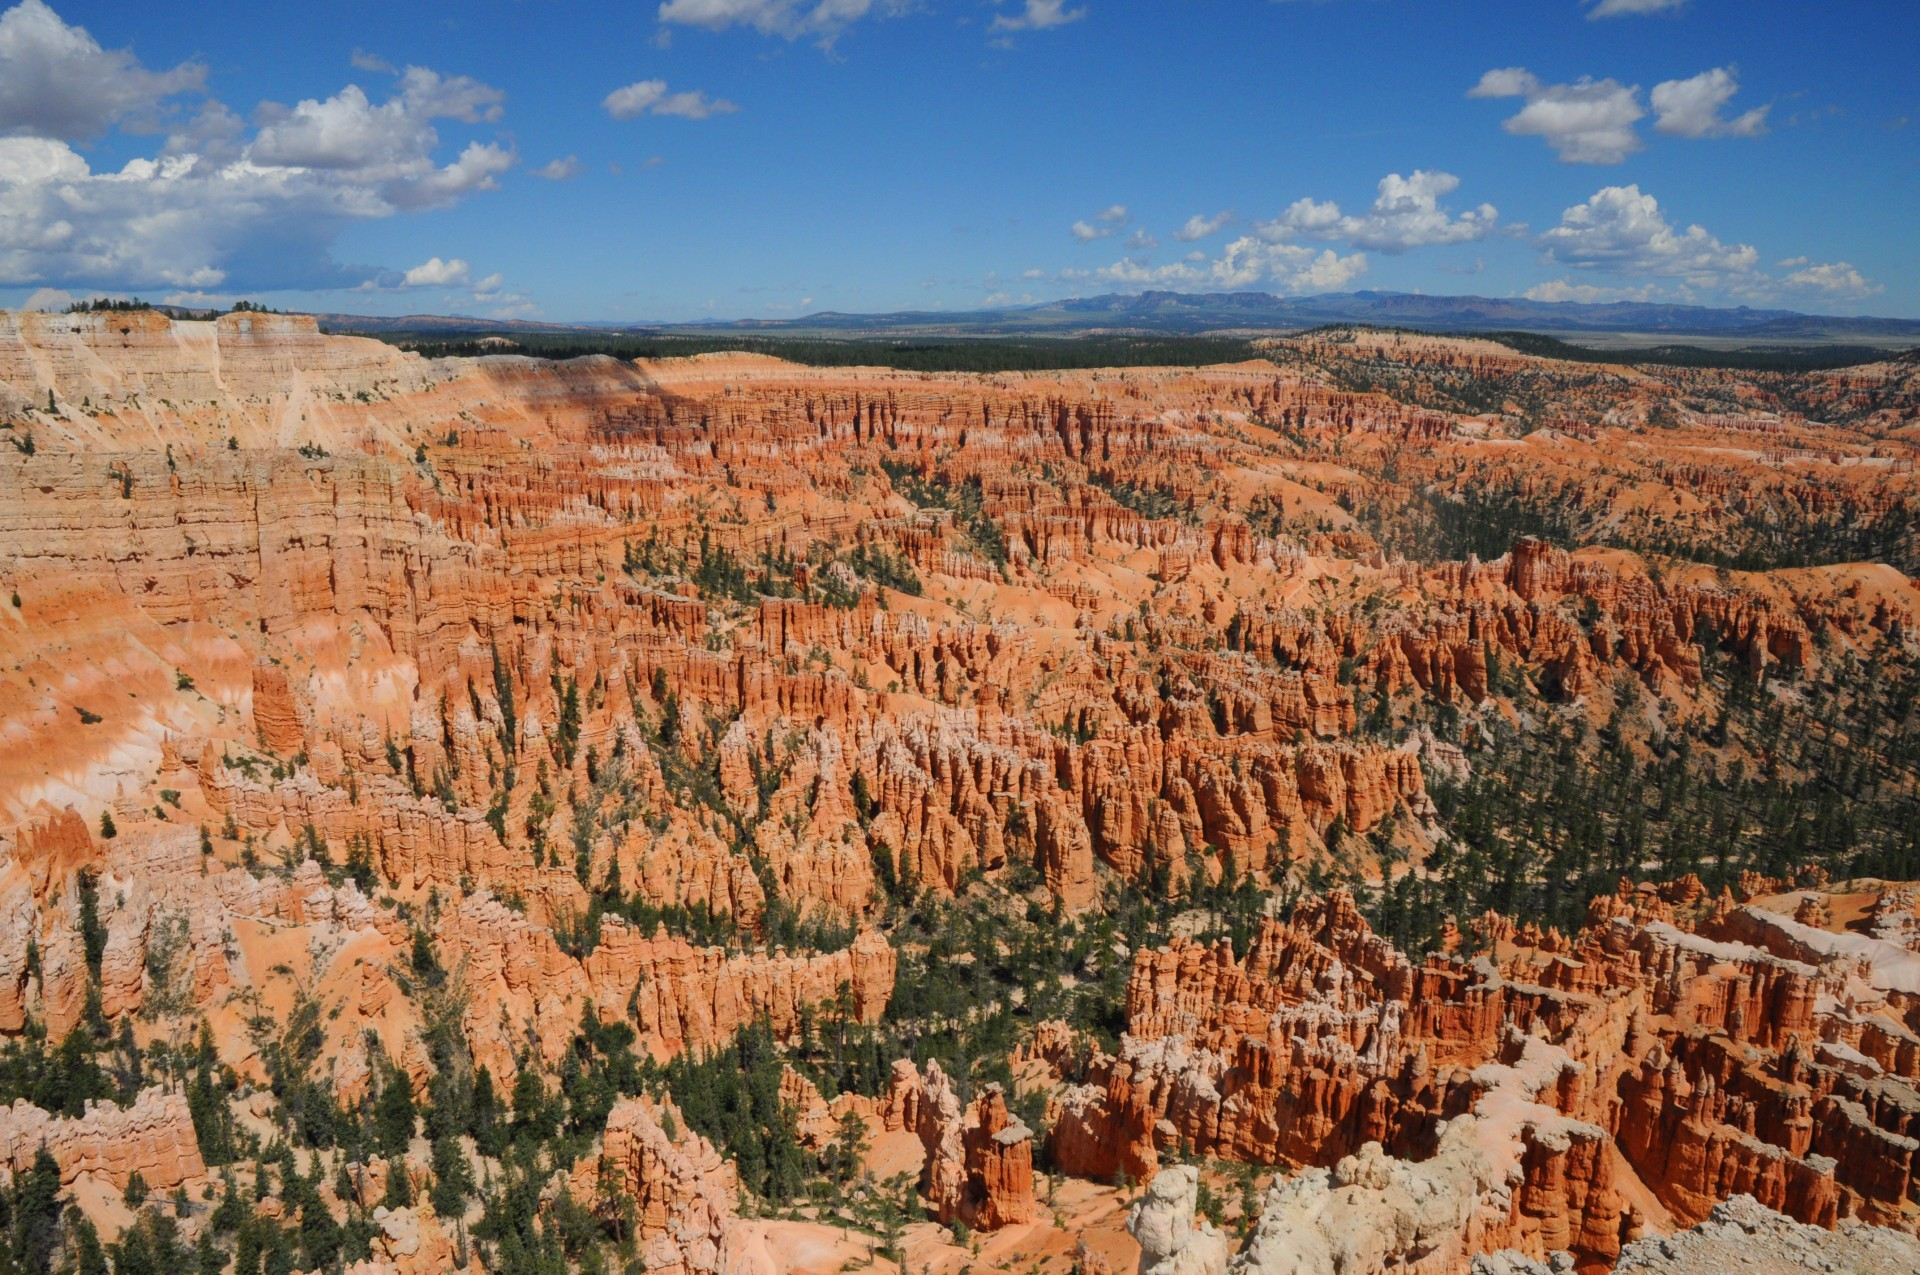 Bryce Canyon - Août 2011 - Hoodoos - Gédéon - Un autre regard sur la Terre